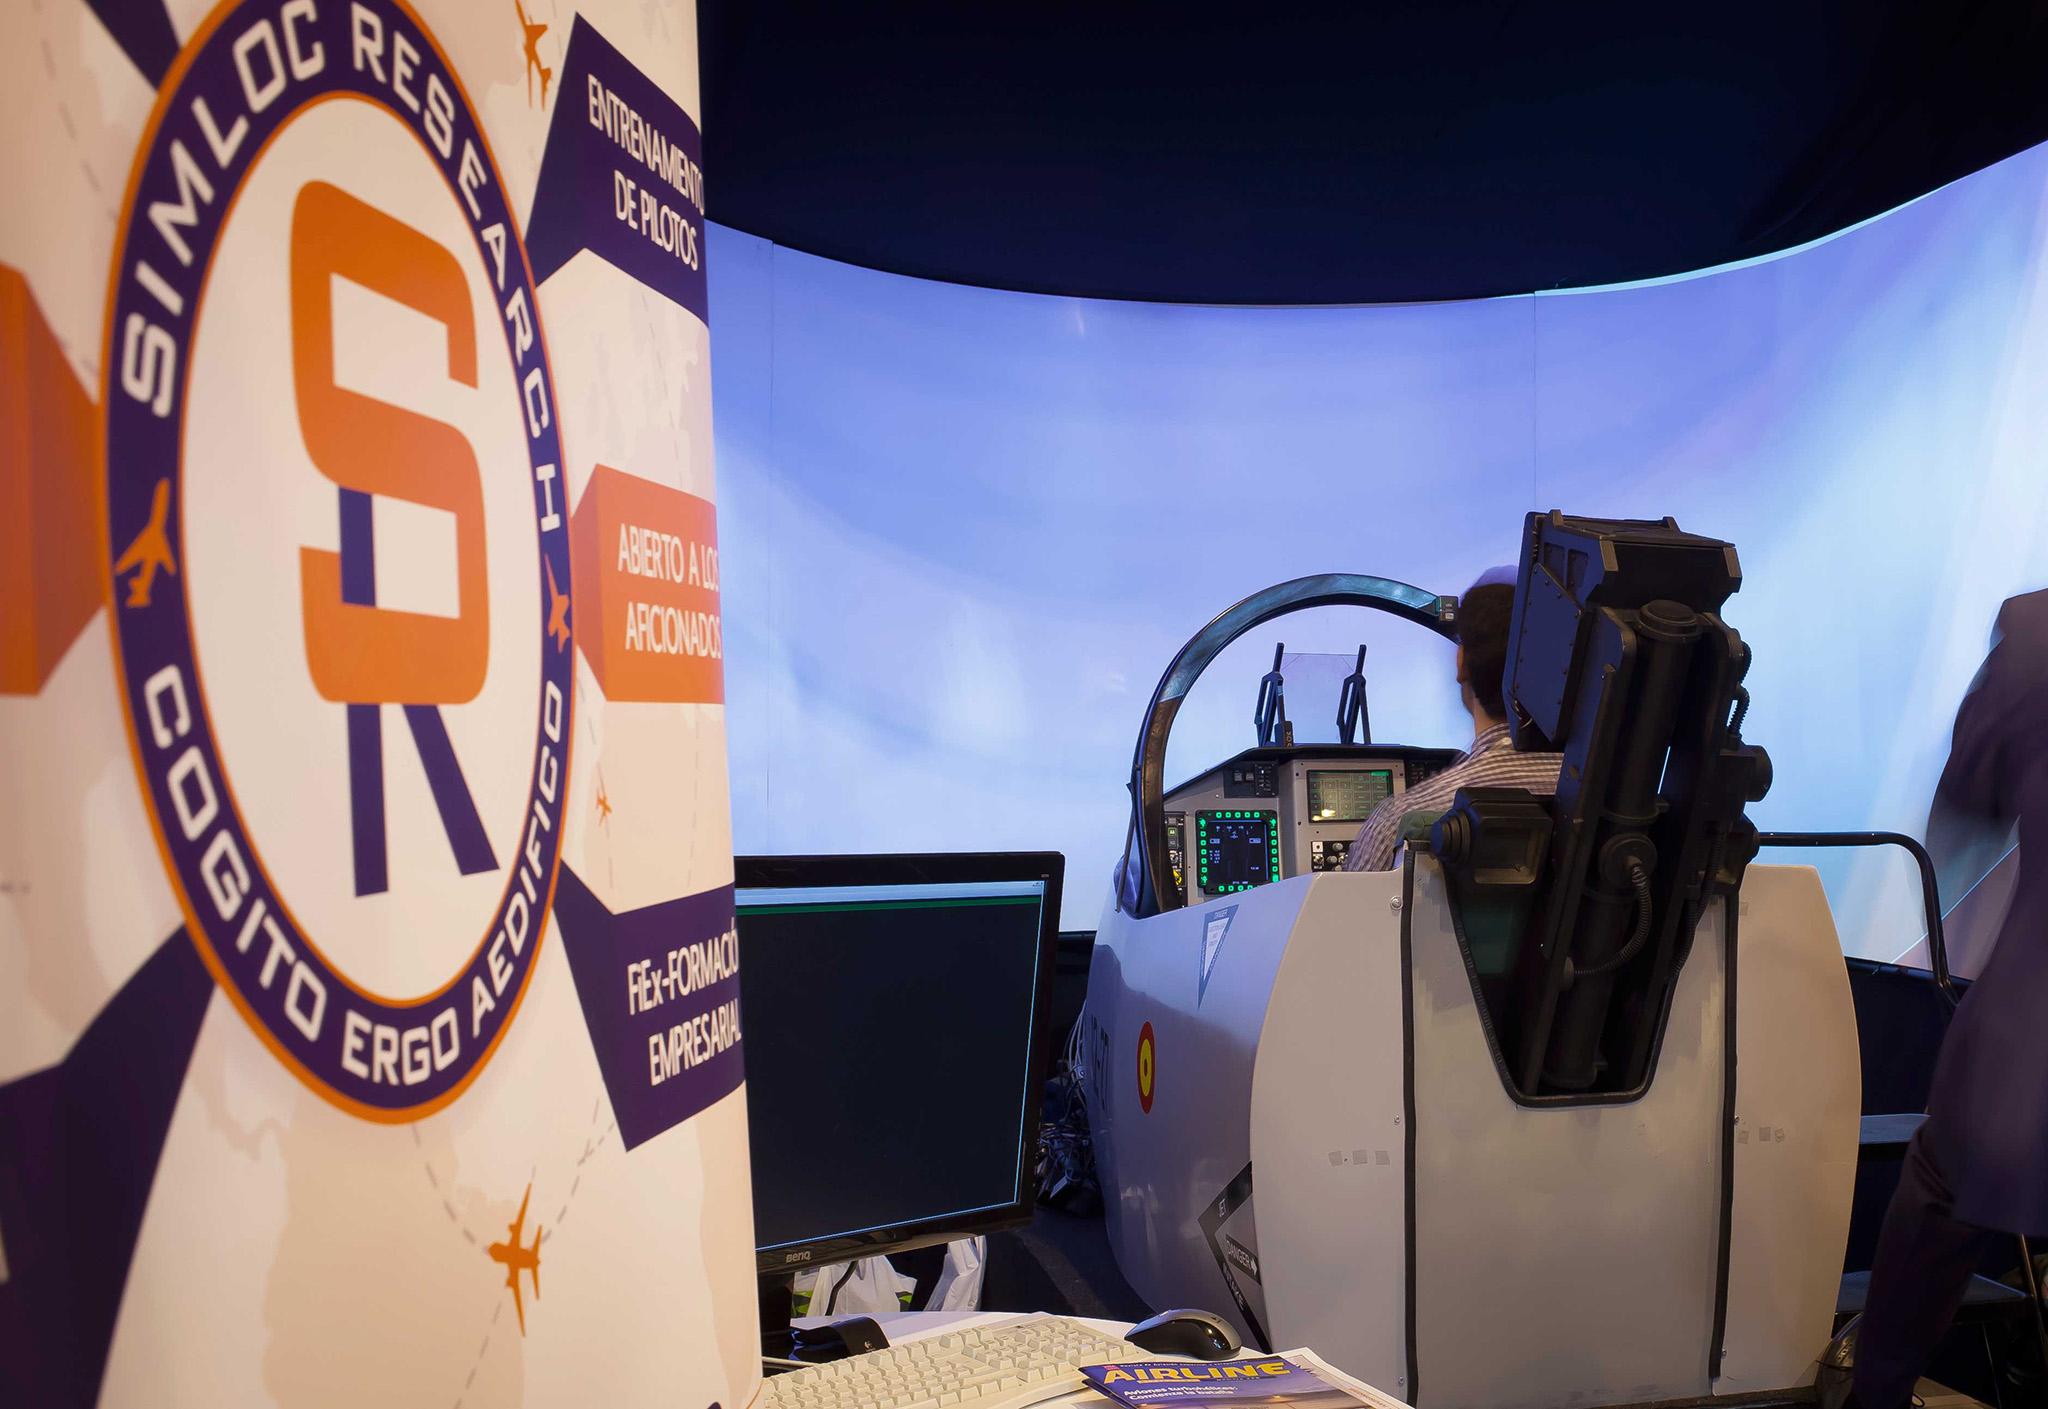 F-18 simloc